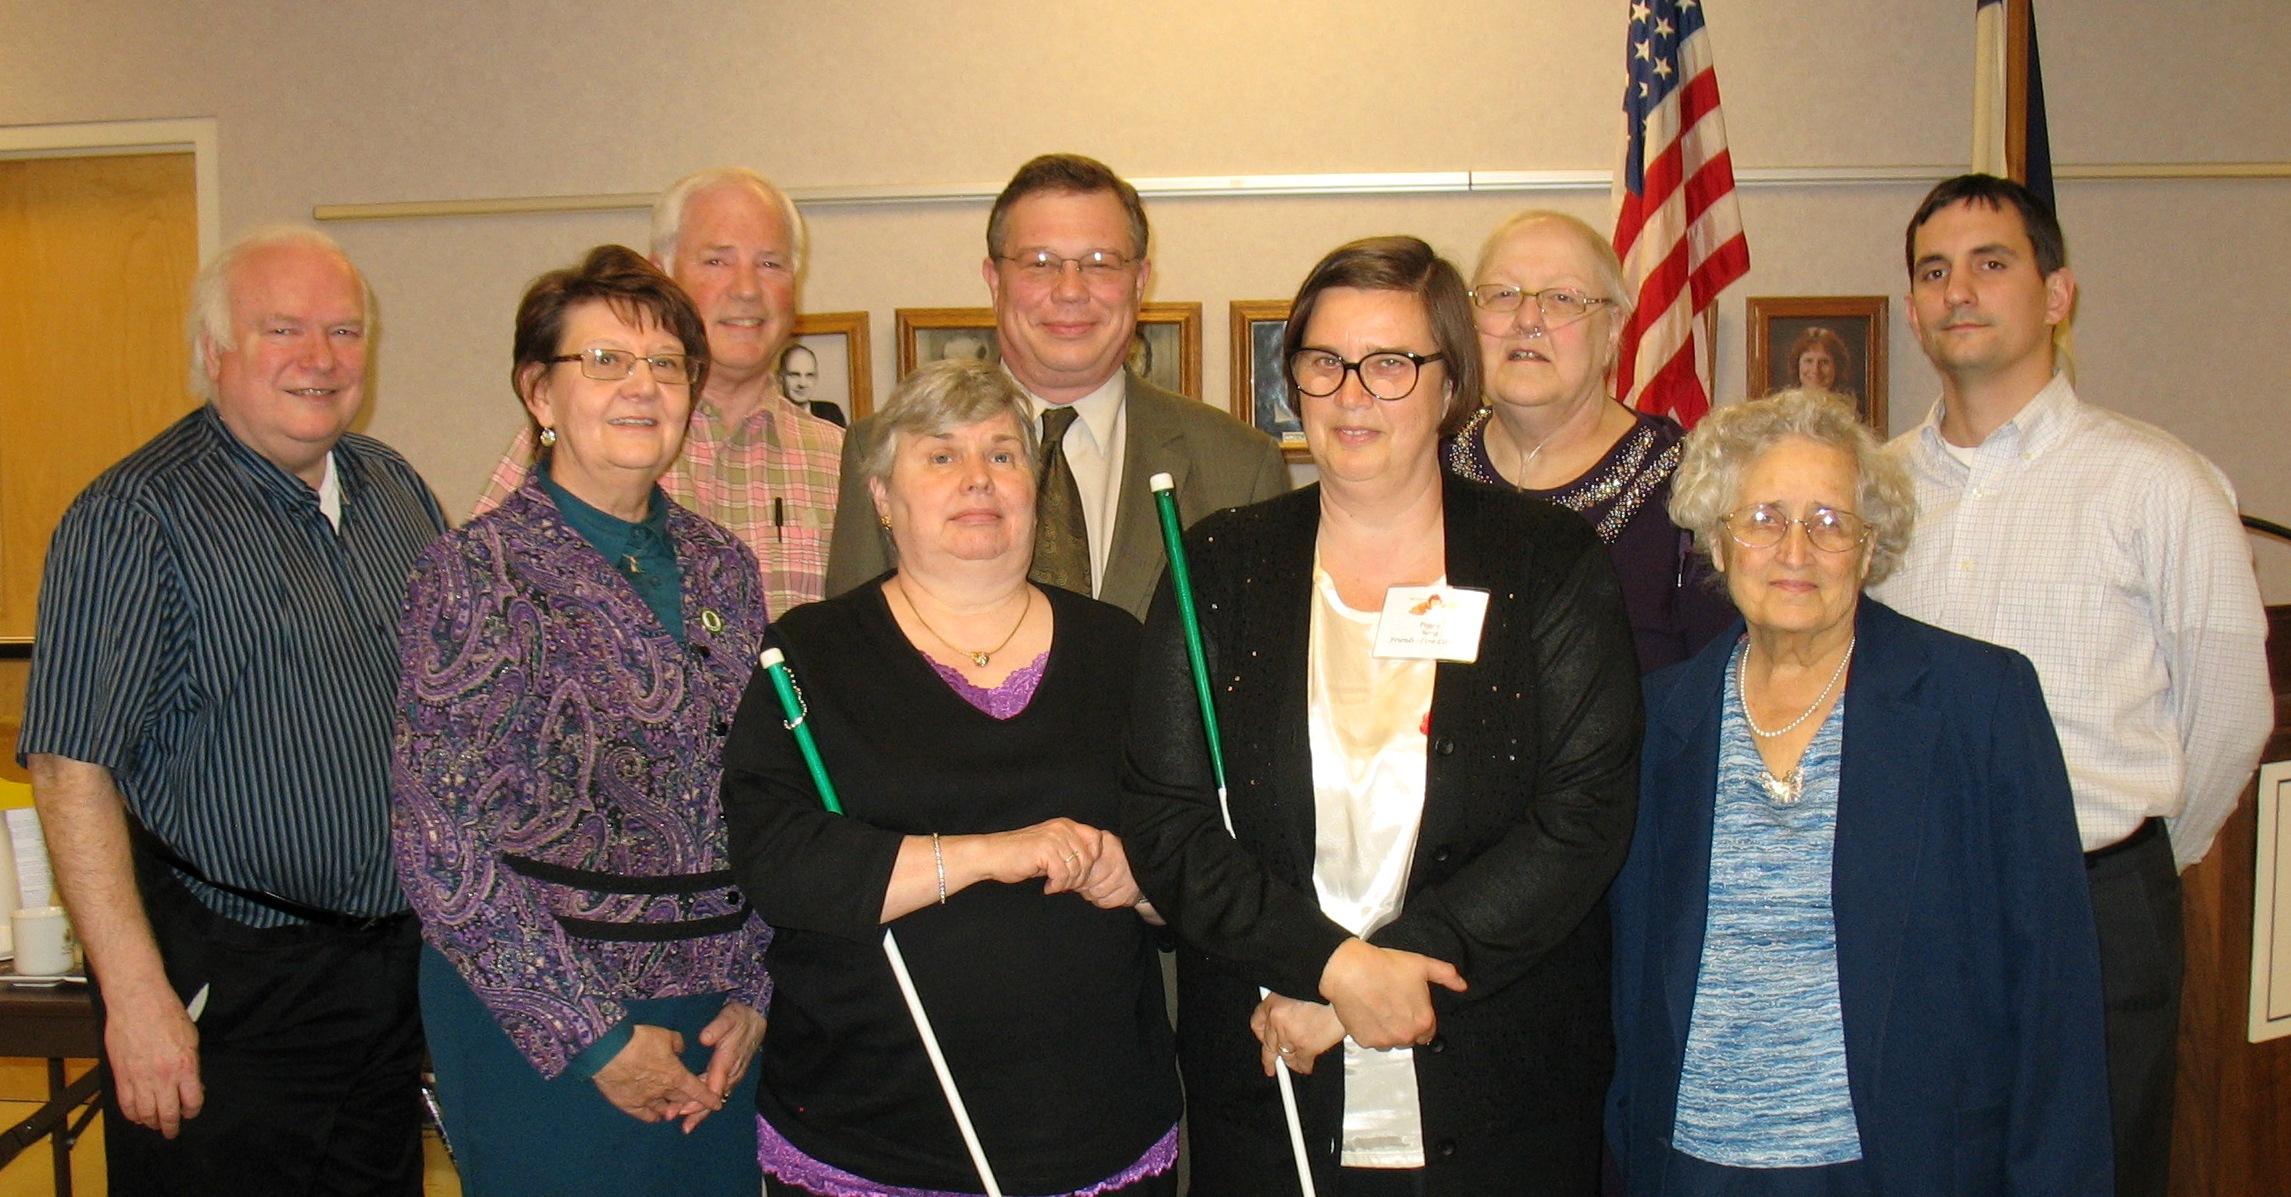 Friends Board from 2011 - Back row: David Hammel, Norman Hall, John Billingsley, Louise Duvall, Korey Keninger; Front row: Marilyn Garvey, JoAnn Slayton, Peggy Chong, and Pat Smith